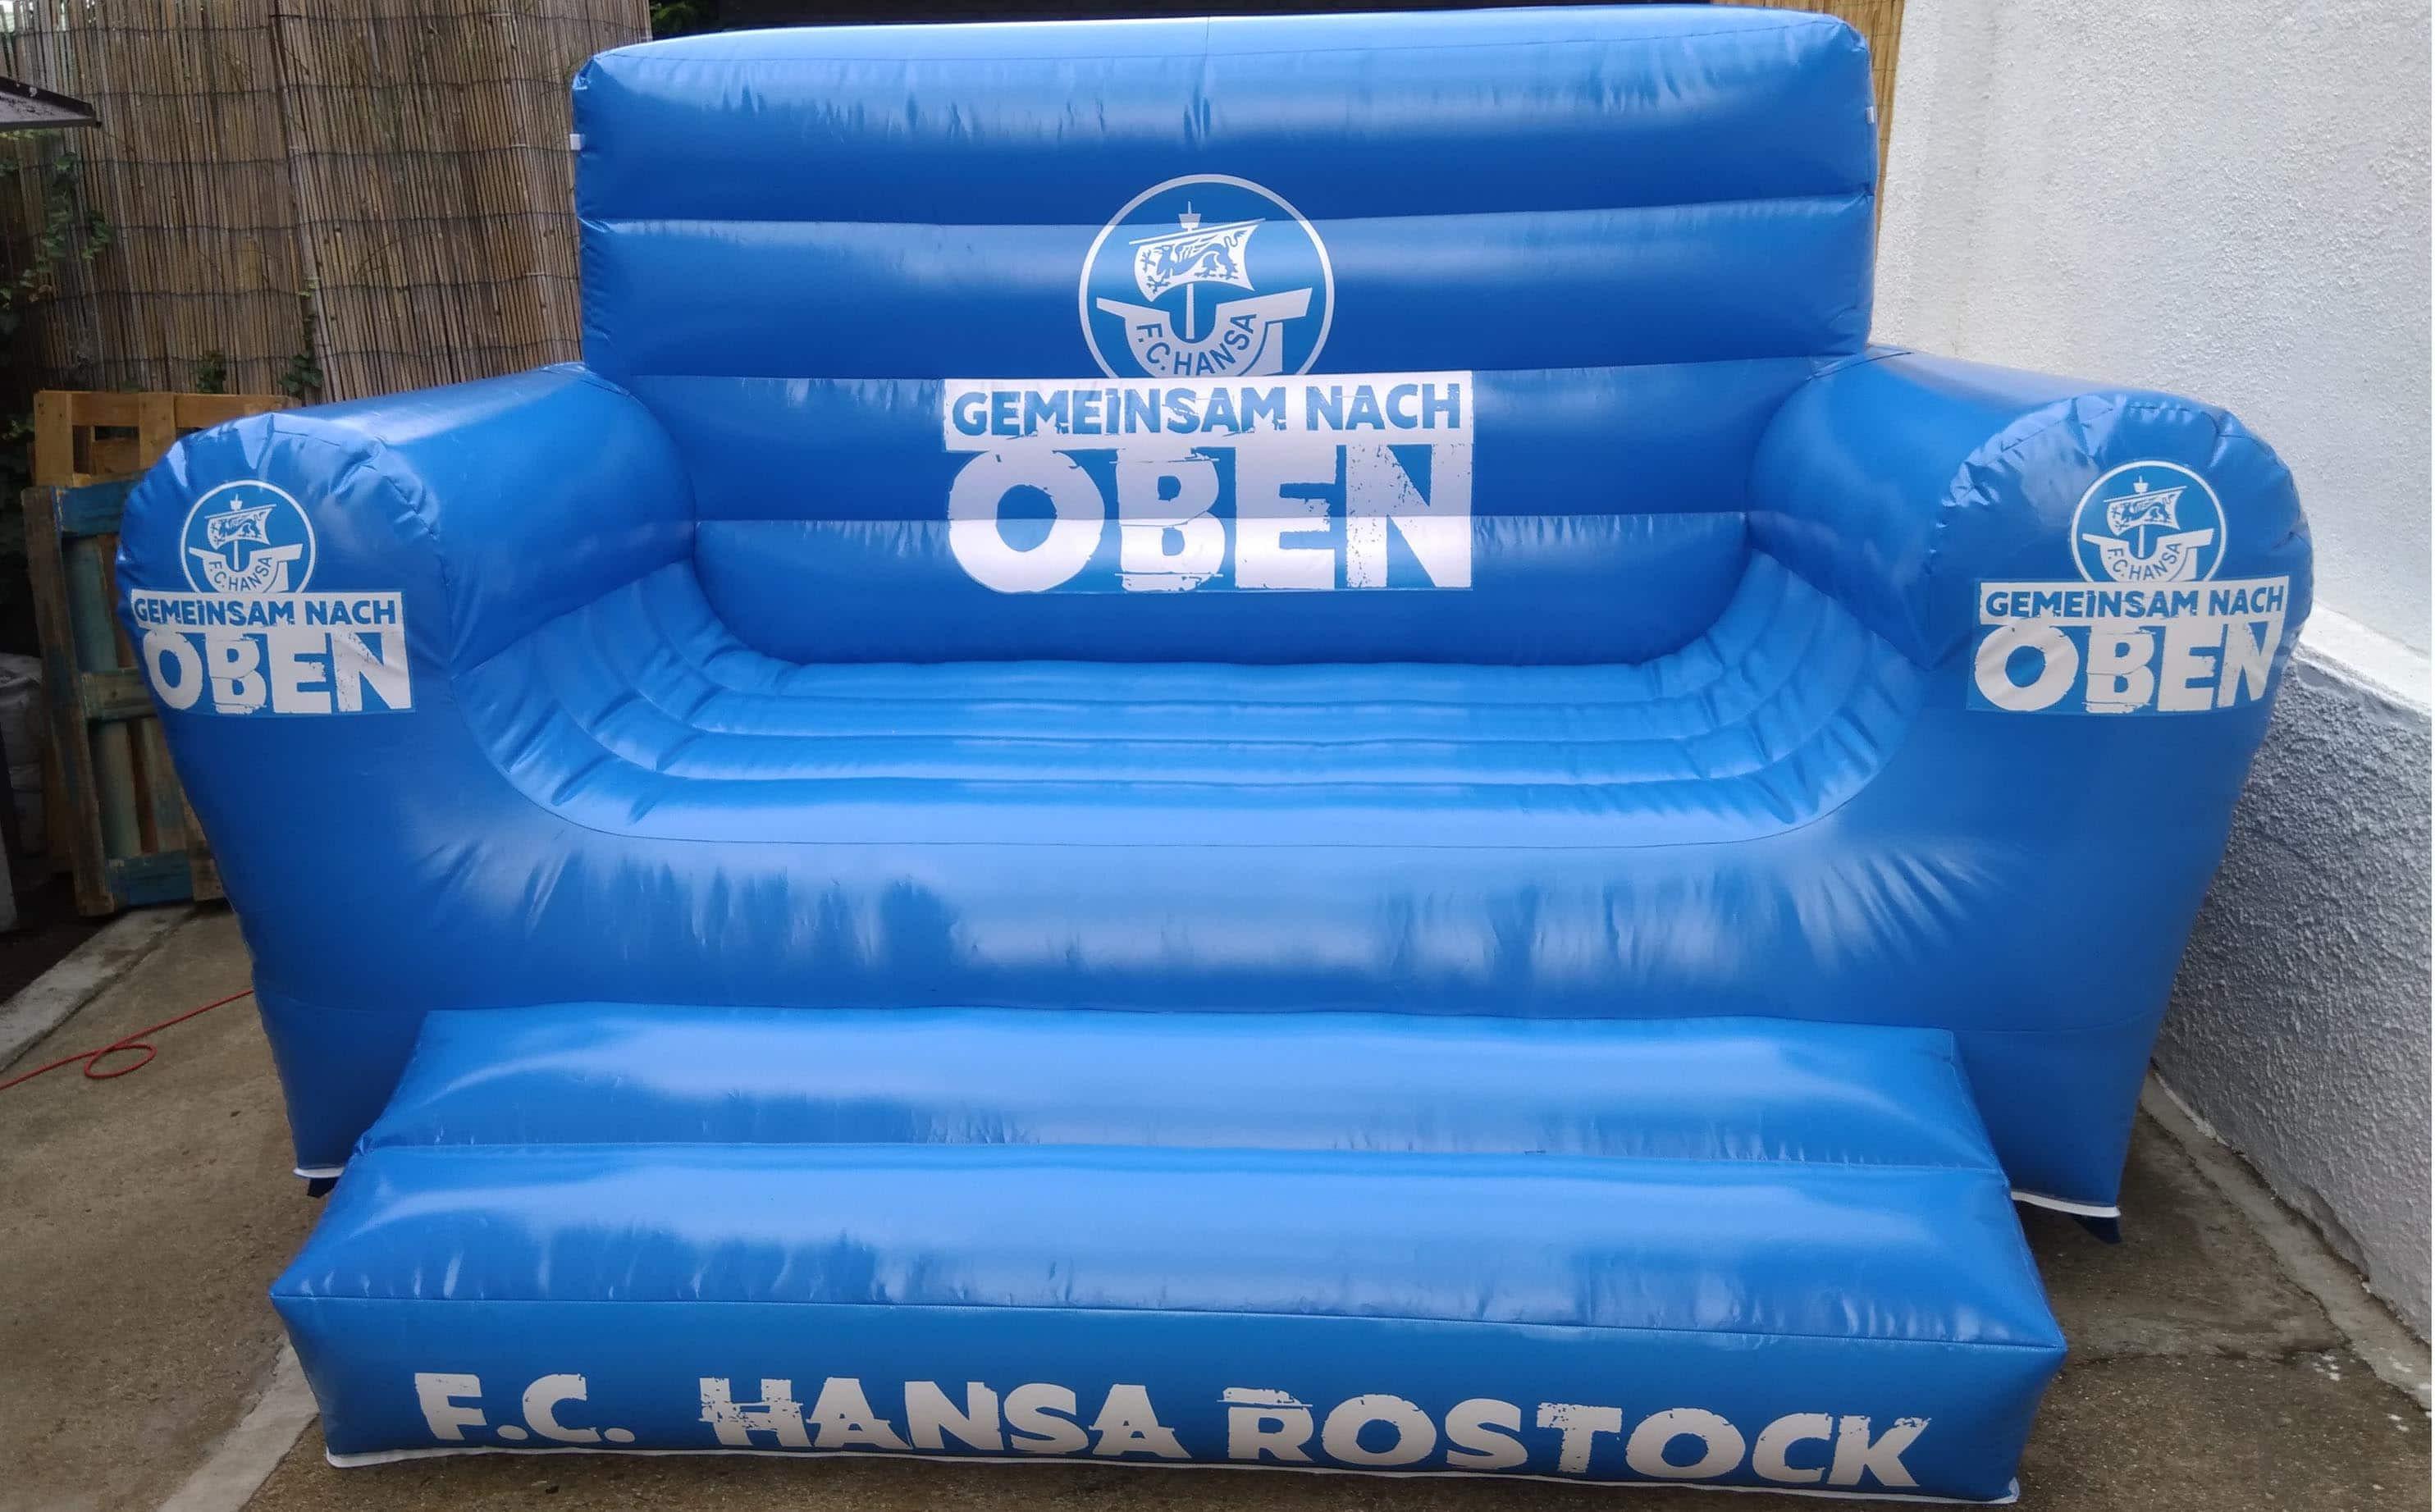 Aufblasbares Sofa  Aufblasbares Riesen Sofa Hansa Rostock AIR promotion